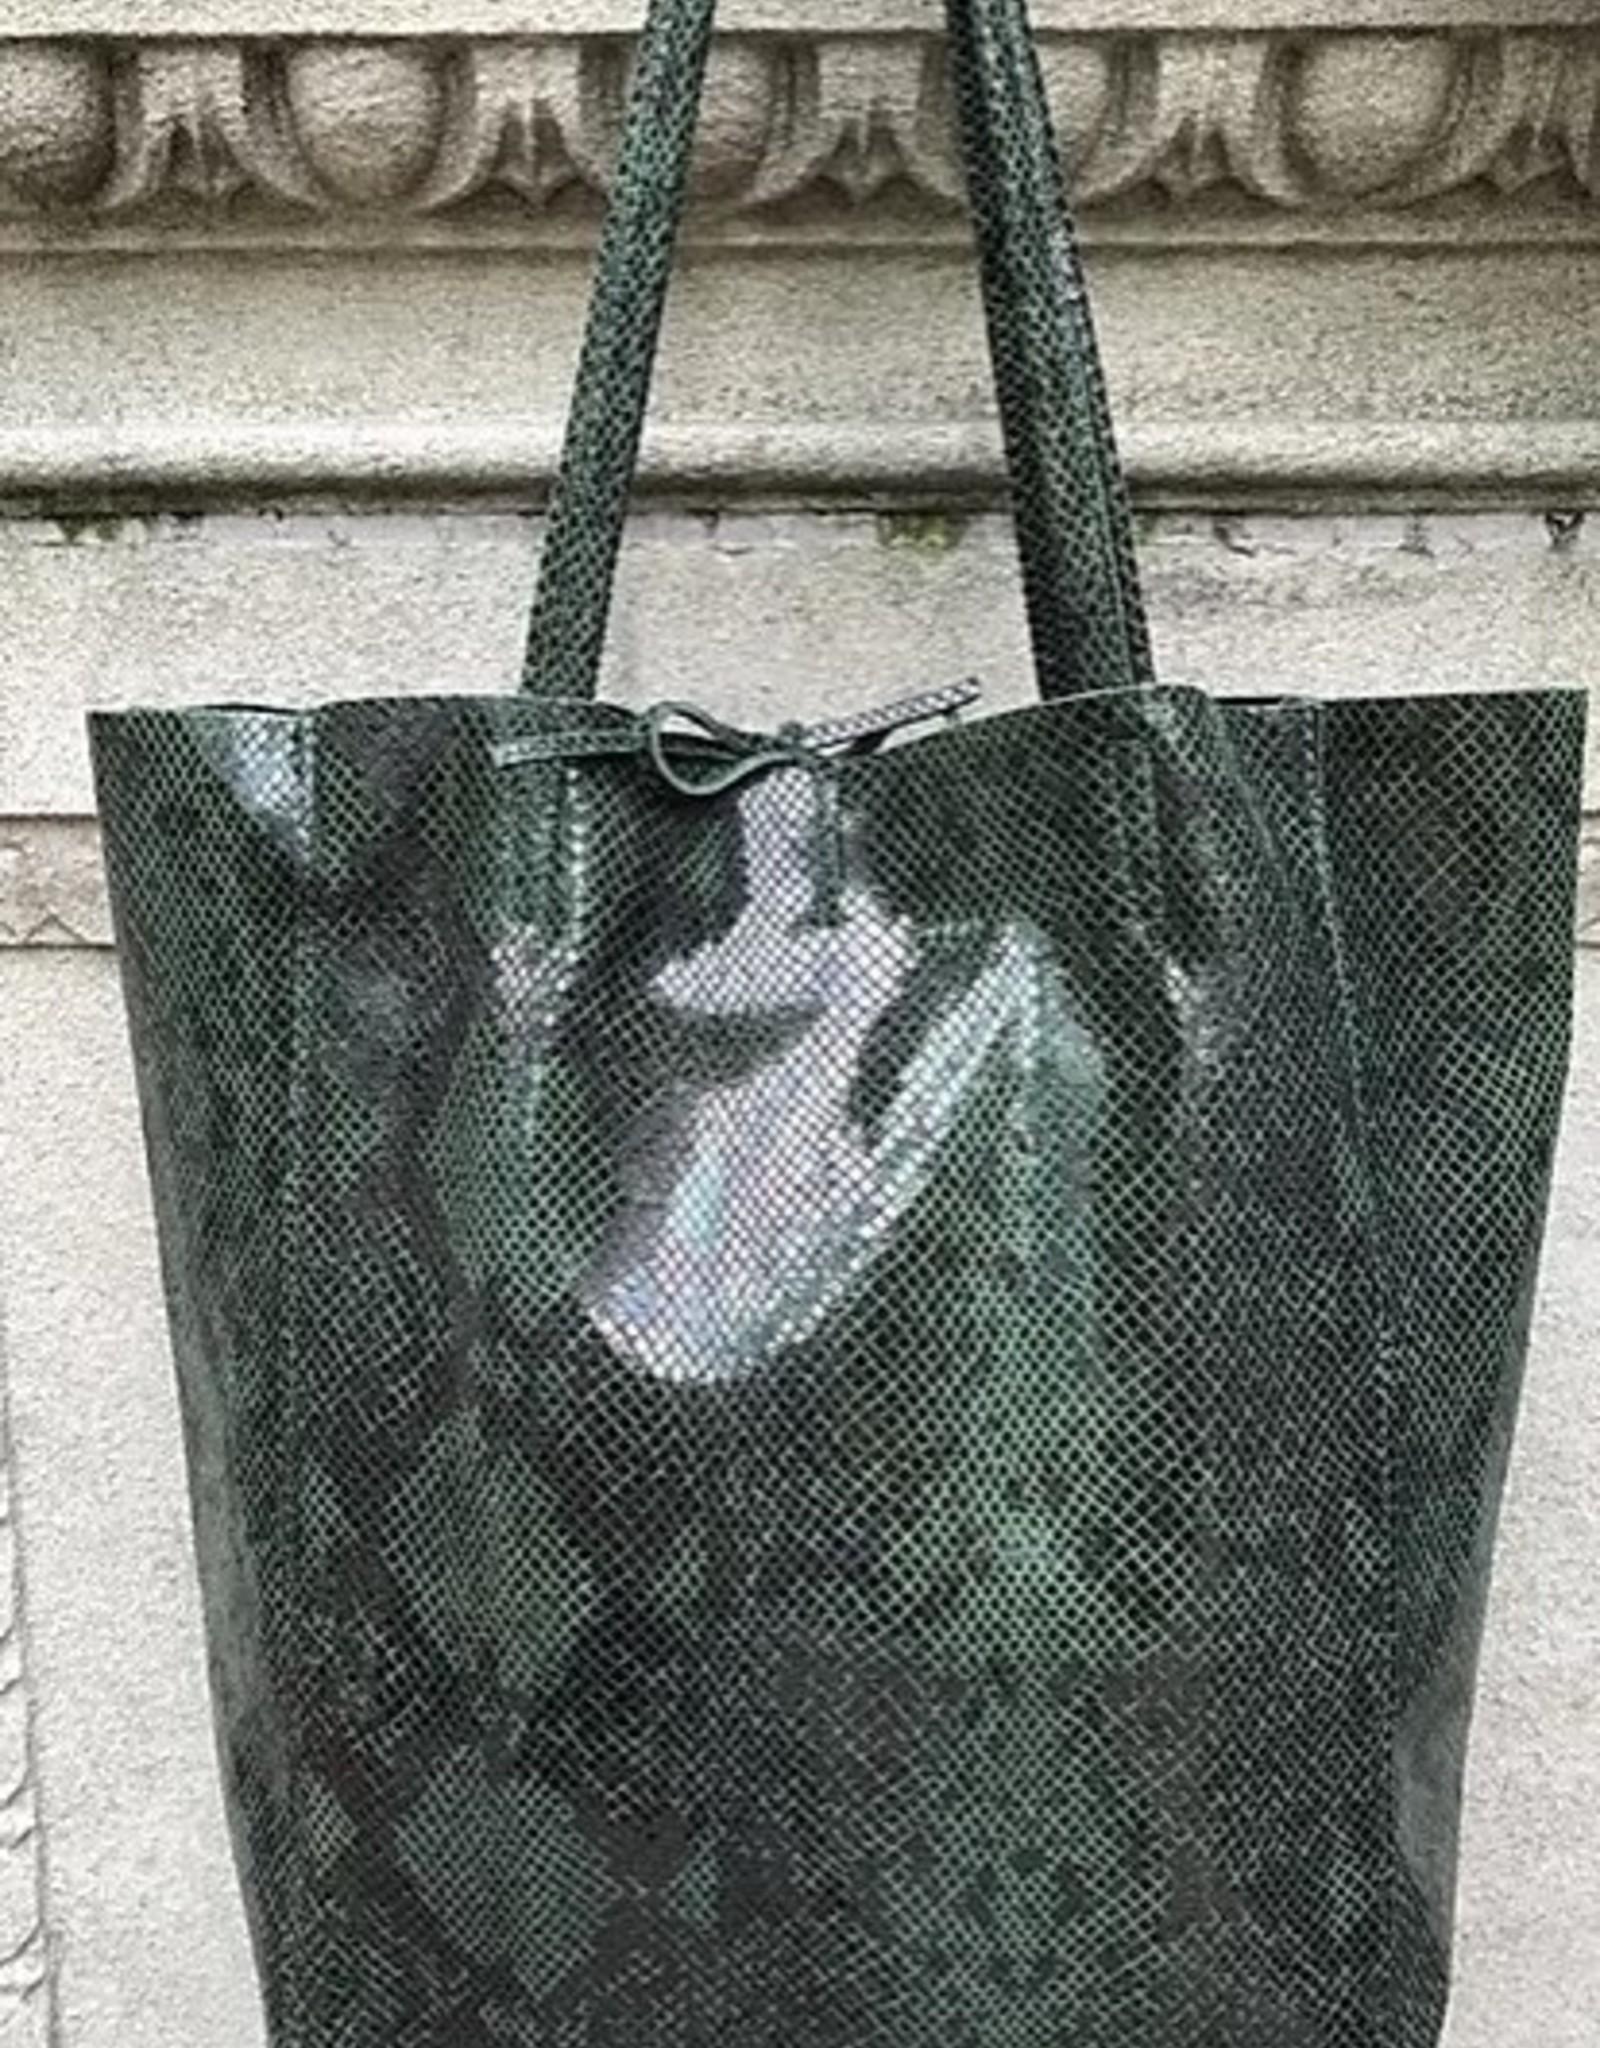 Jijou Capri Snake Print Leather Tote